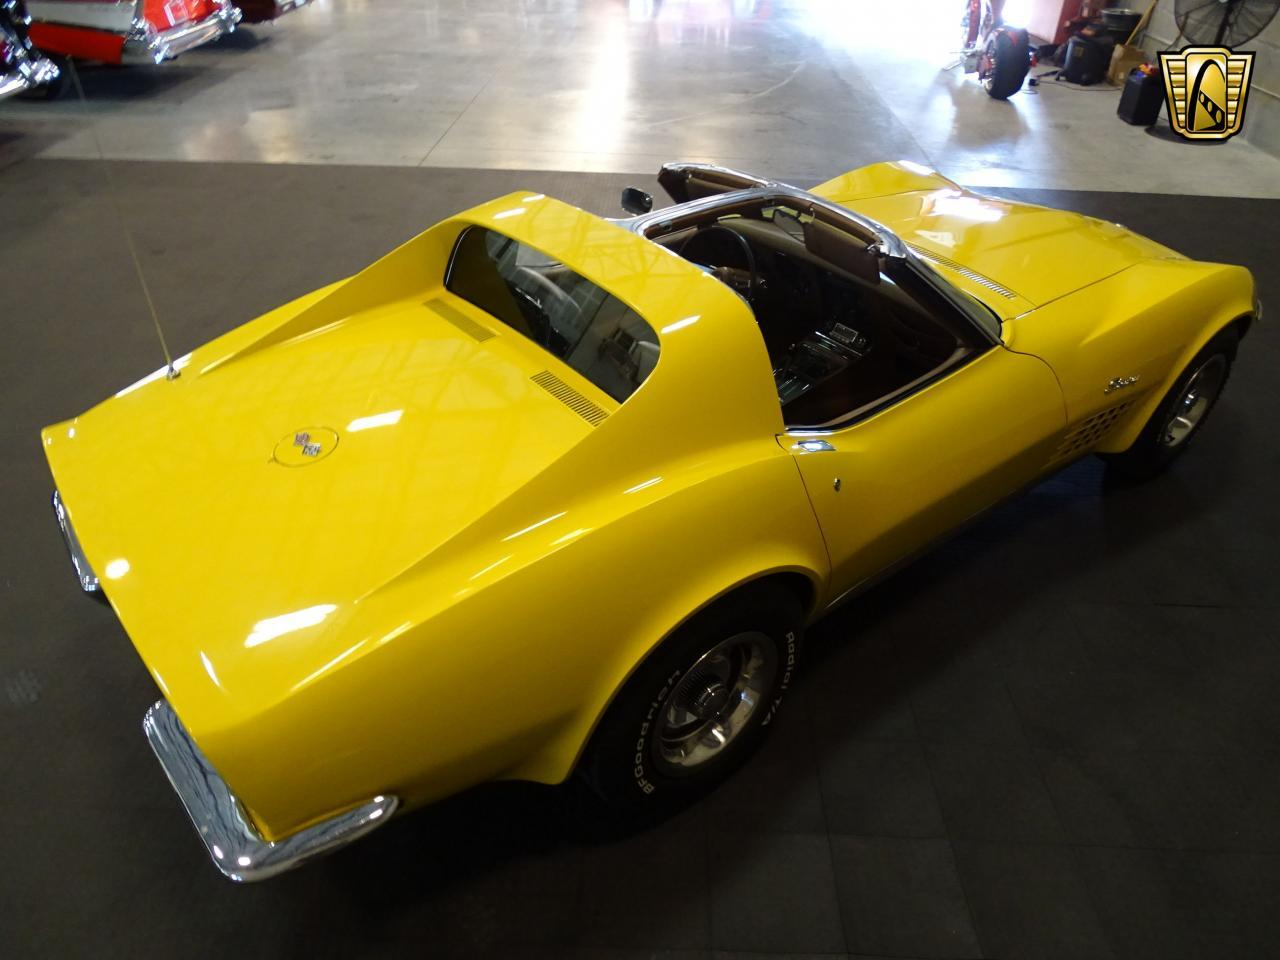 Large Picture of Classic '71 Chevrolet Corvette located in Florida - $28,995.00 - LOPO